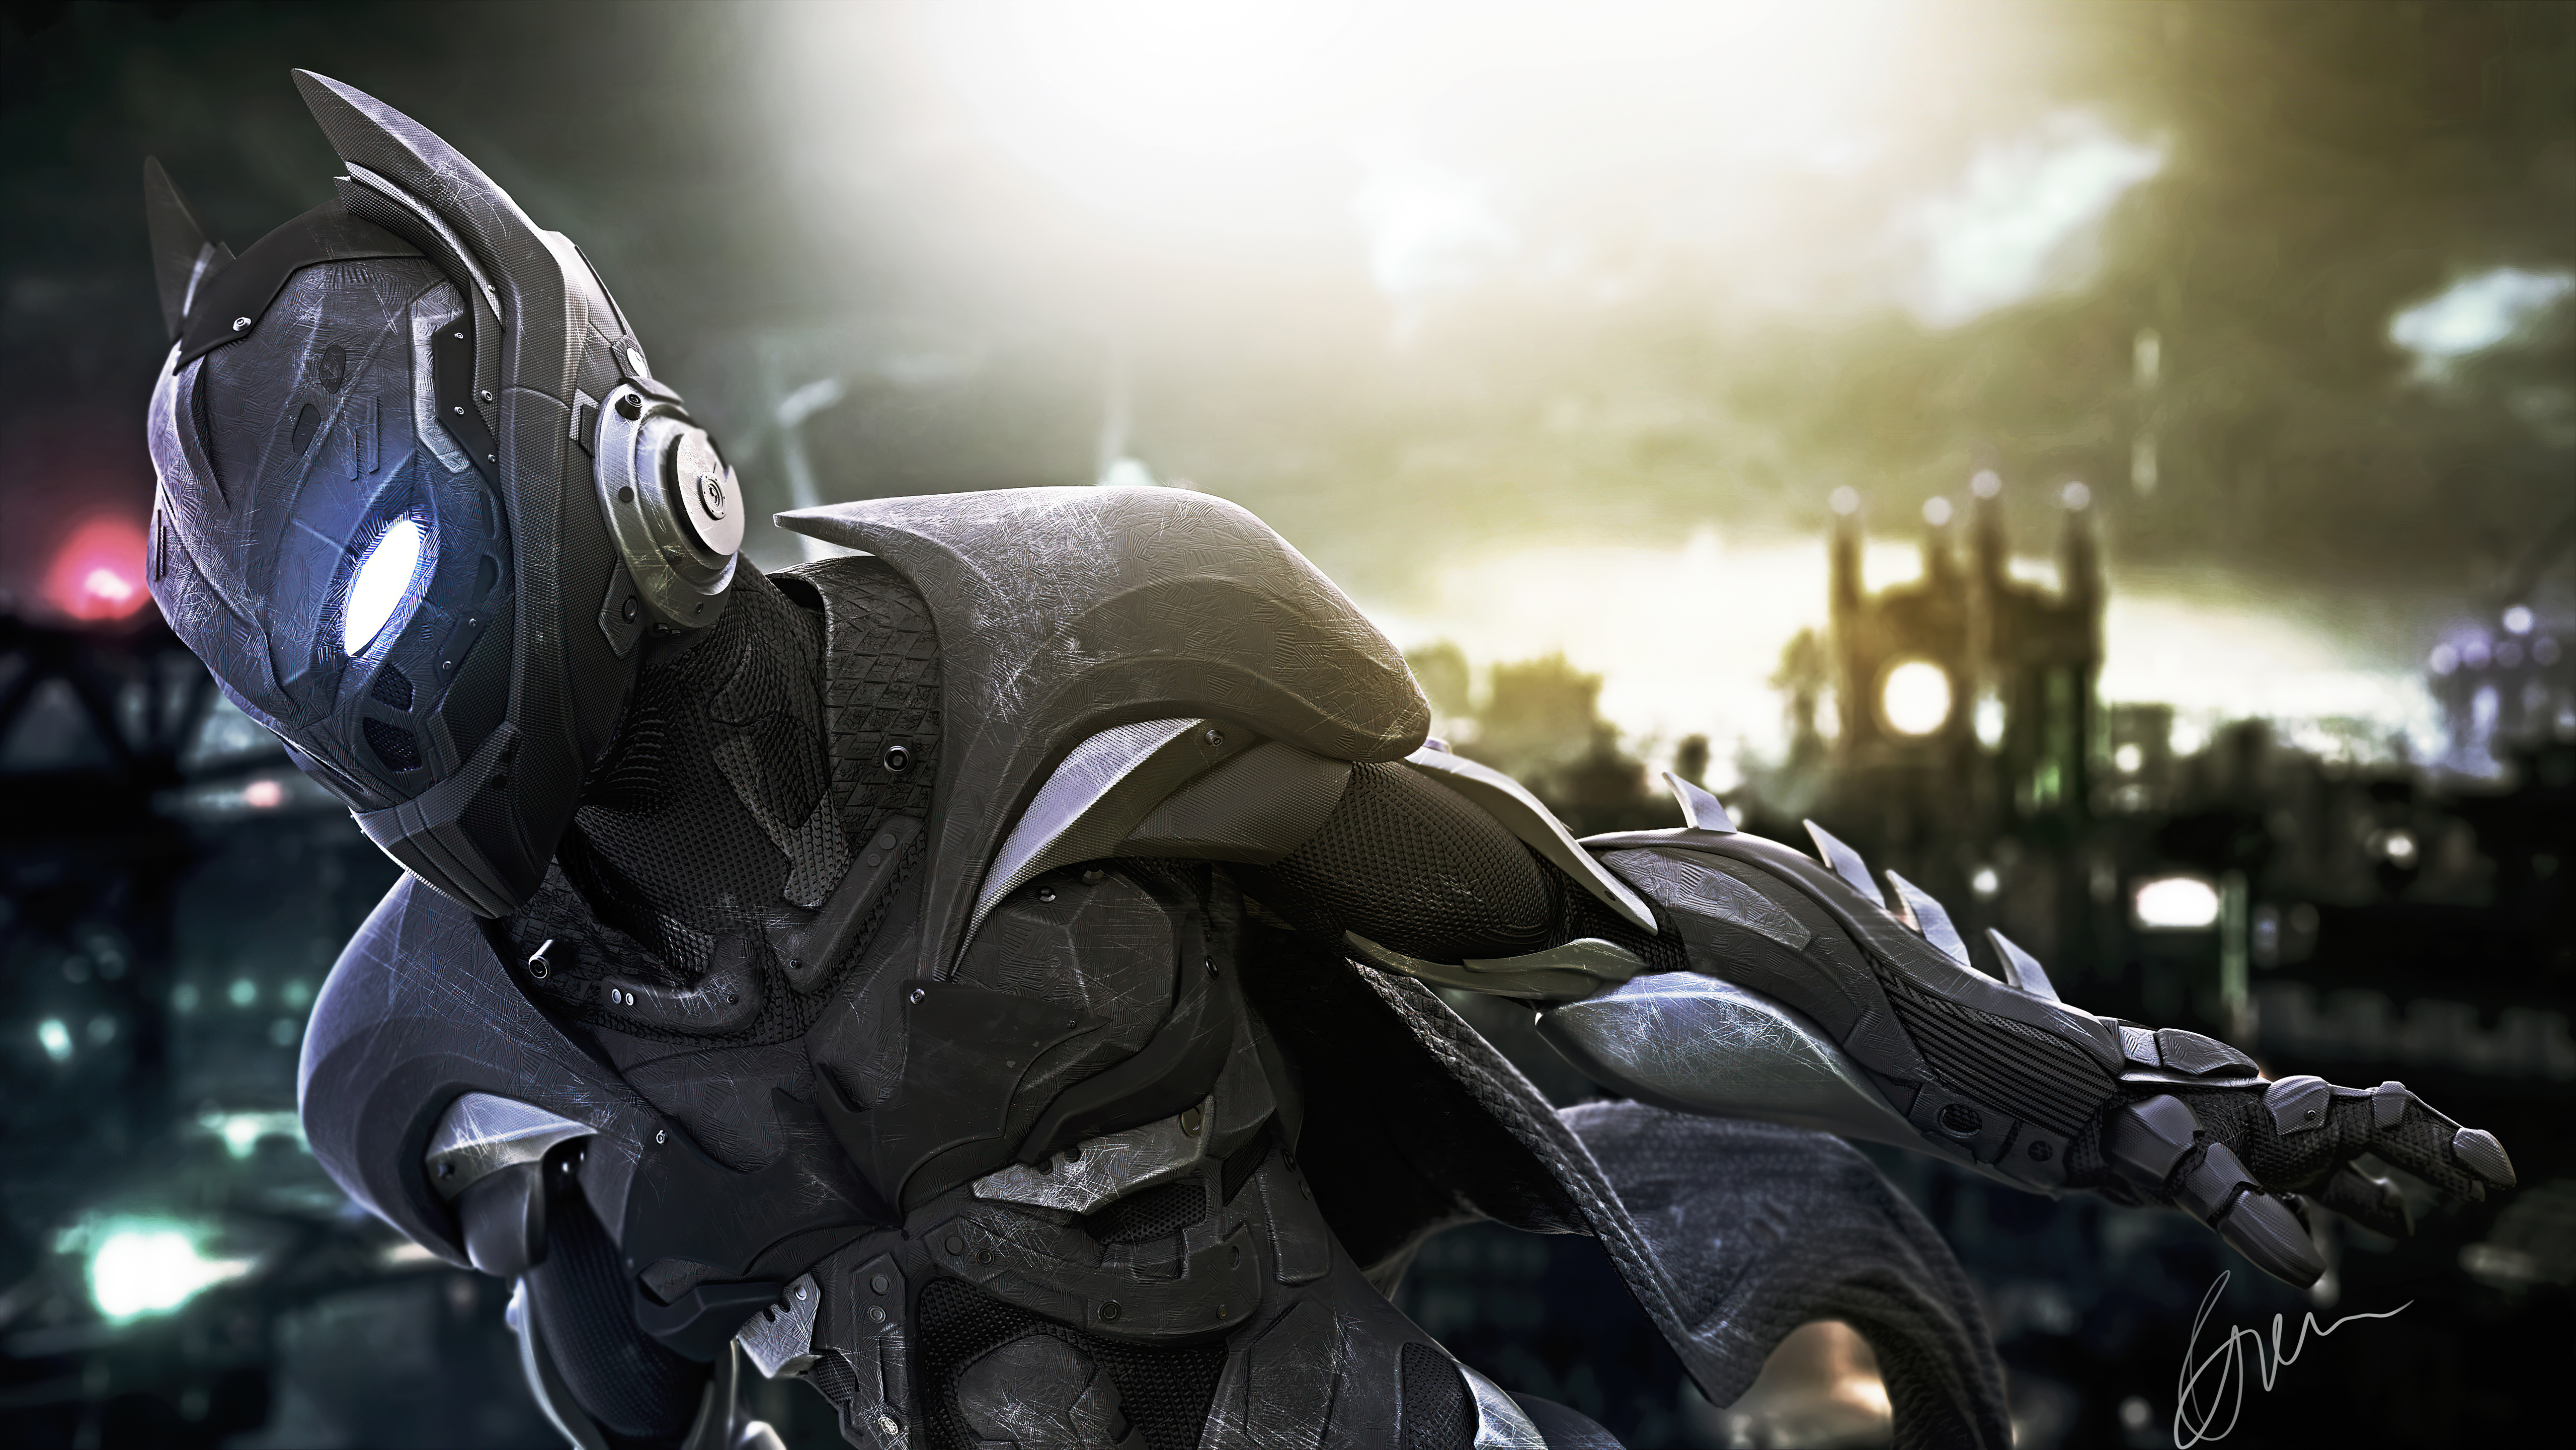 nks batman arkham knight 4k 1610662349 - Nks Batman Arkham Knight 4k - Nks Batman Arkham Knight 4k